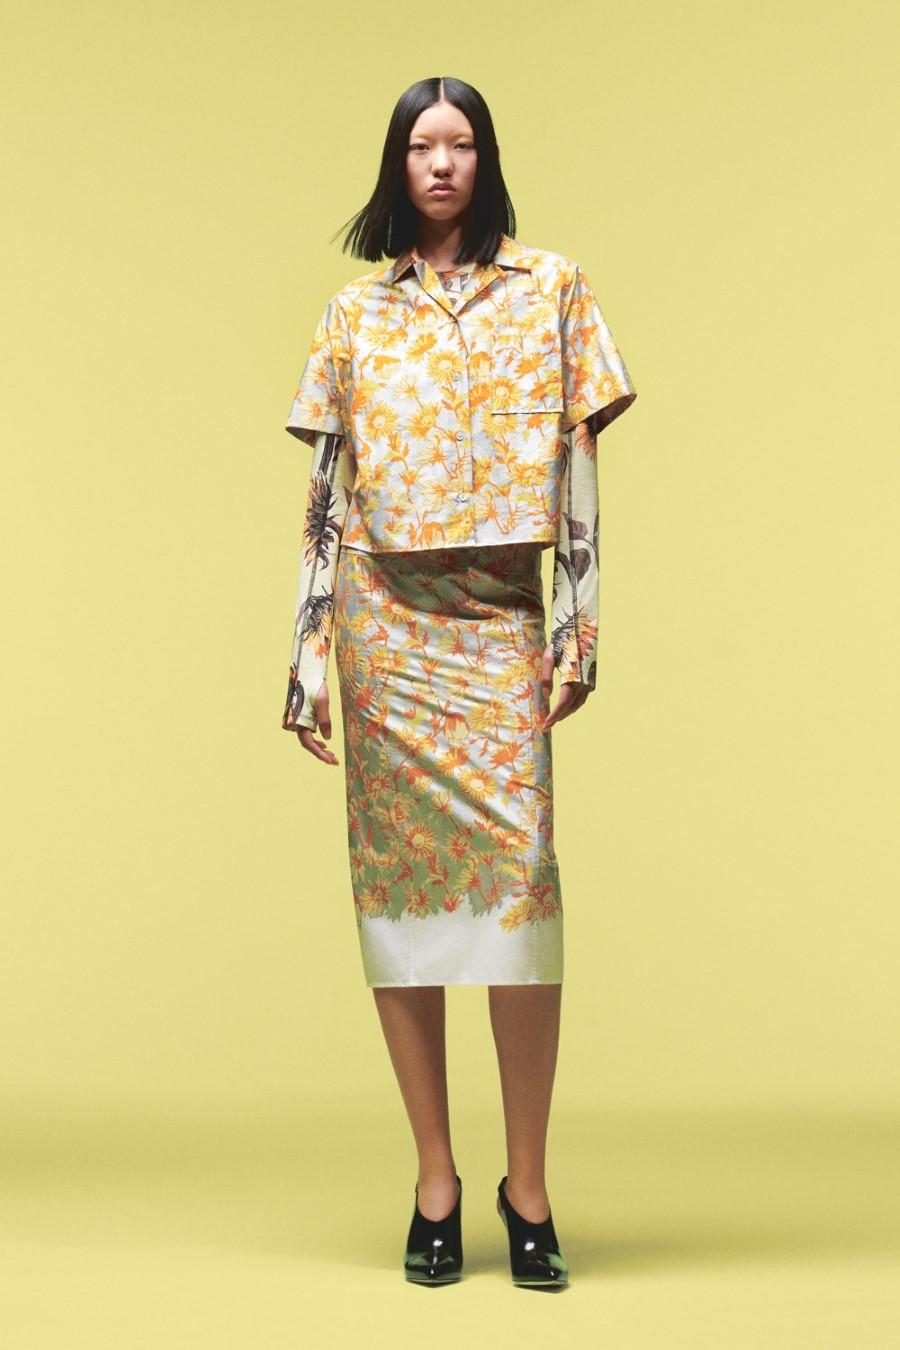 Paul Smith Spring Summer 2022 - Paris Fashion Week